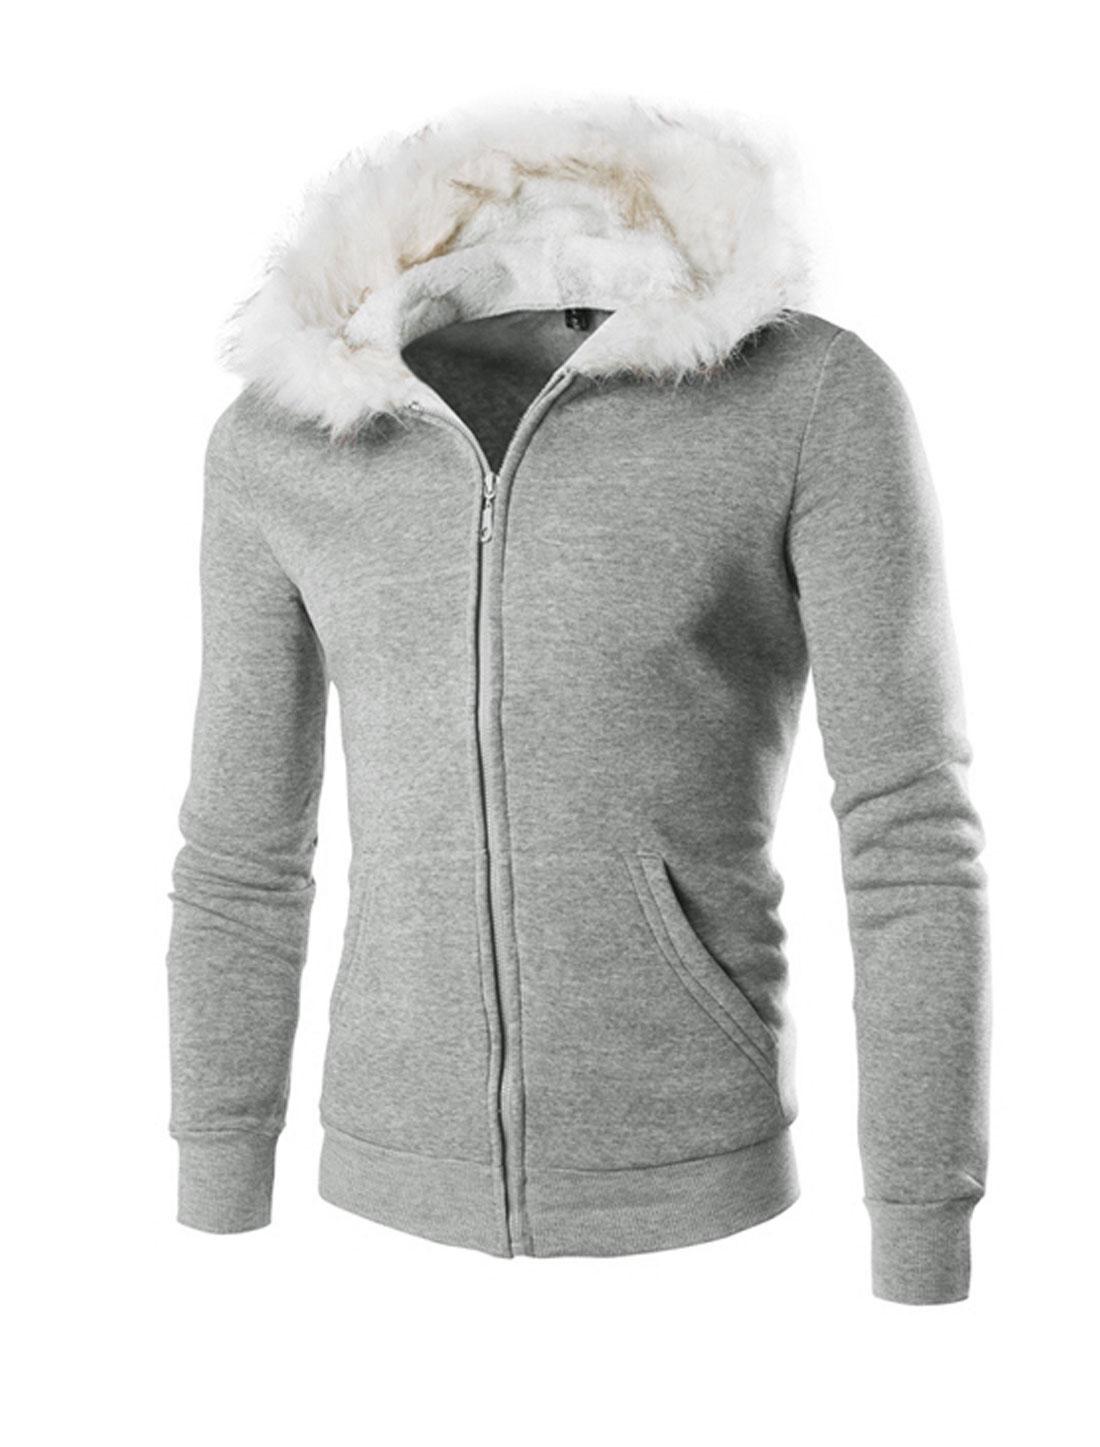 Men Long Sleeves Zipper Casual Hooded Jacket Light Gray M